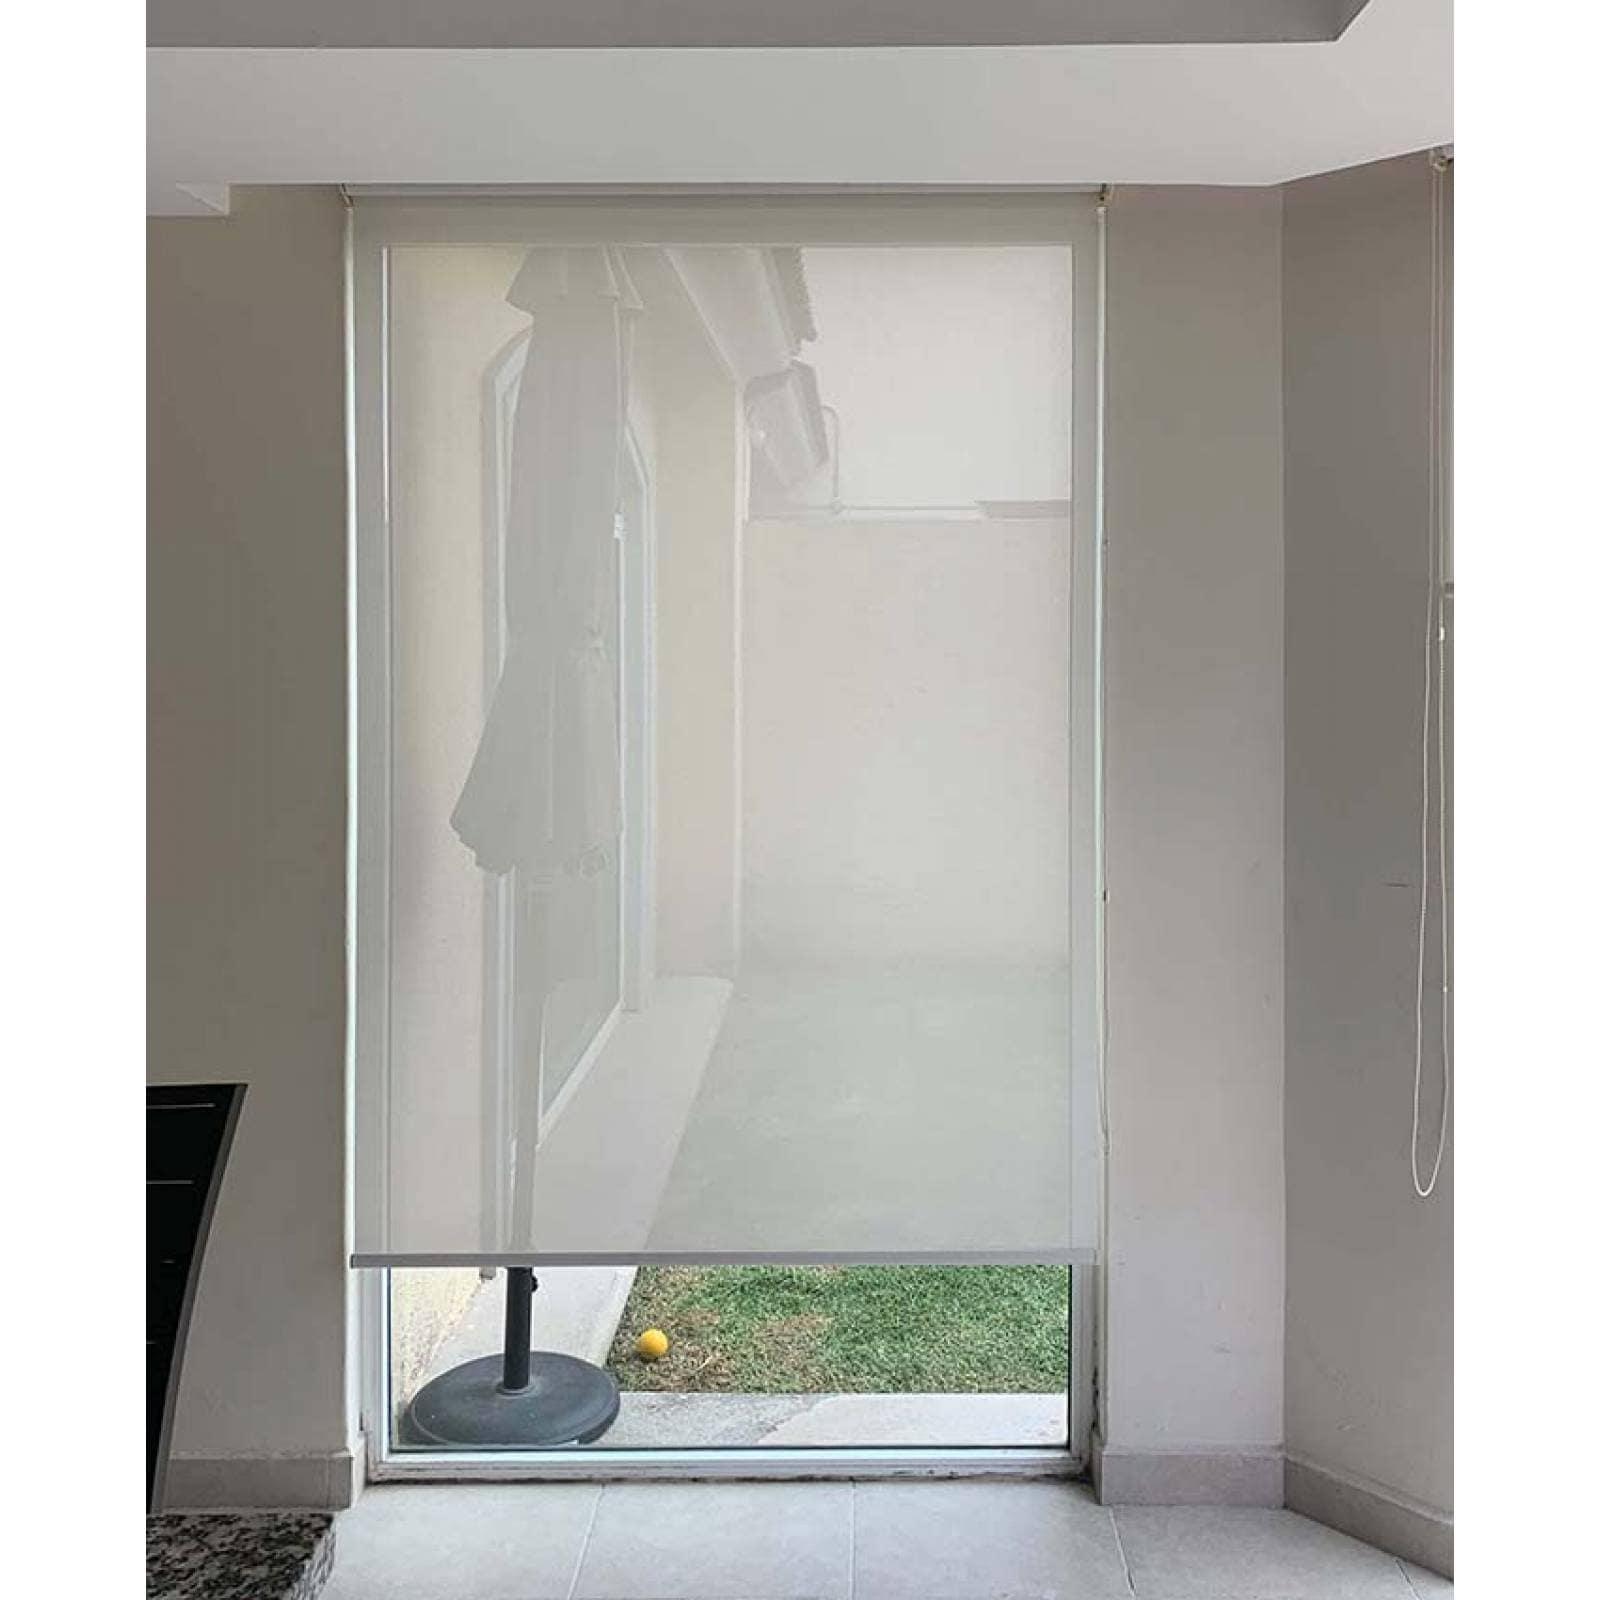 Persianas Malla Solar modelo Screen Soft 100 cm de ancho X hasta 100 cm de largo